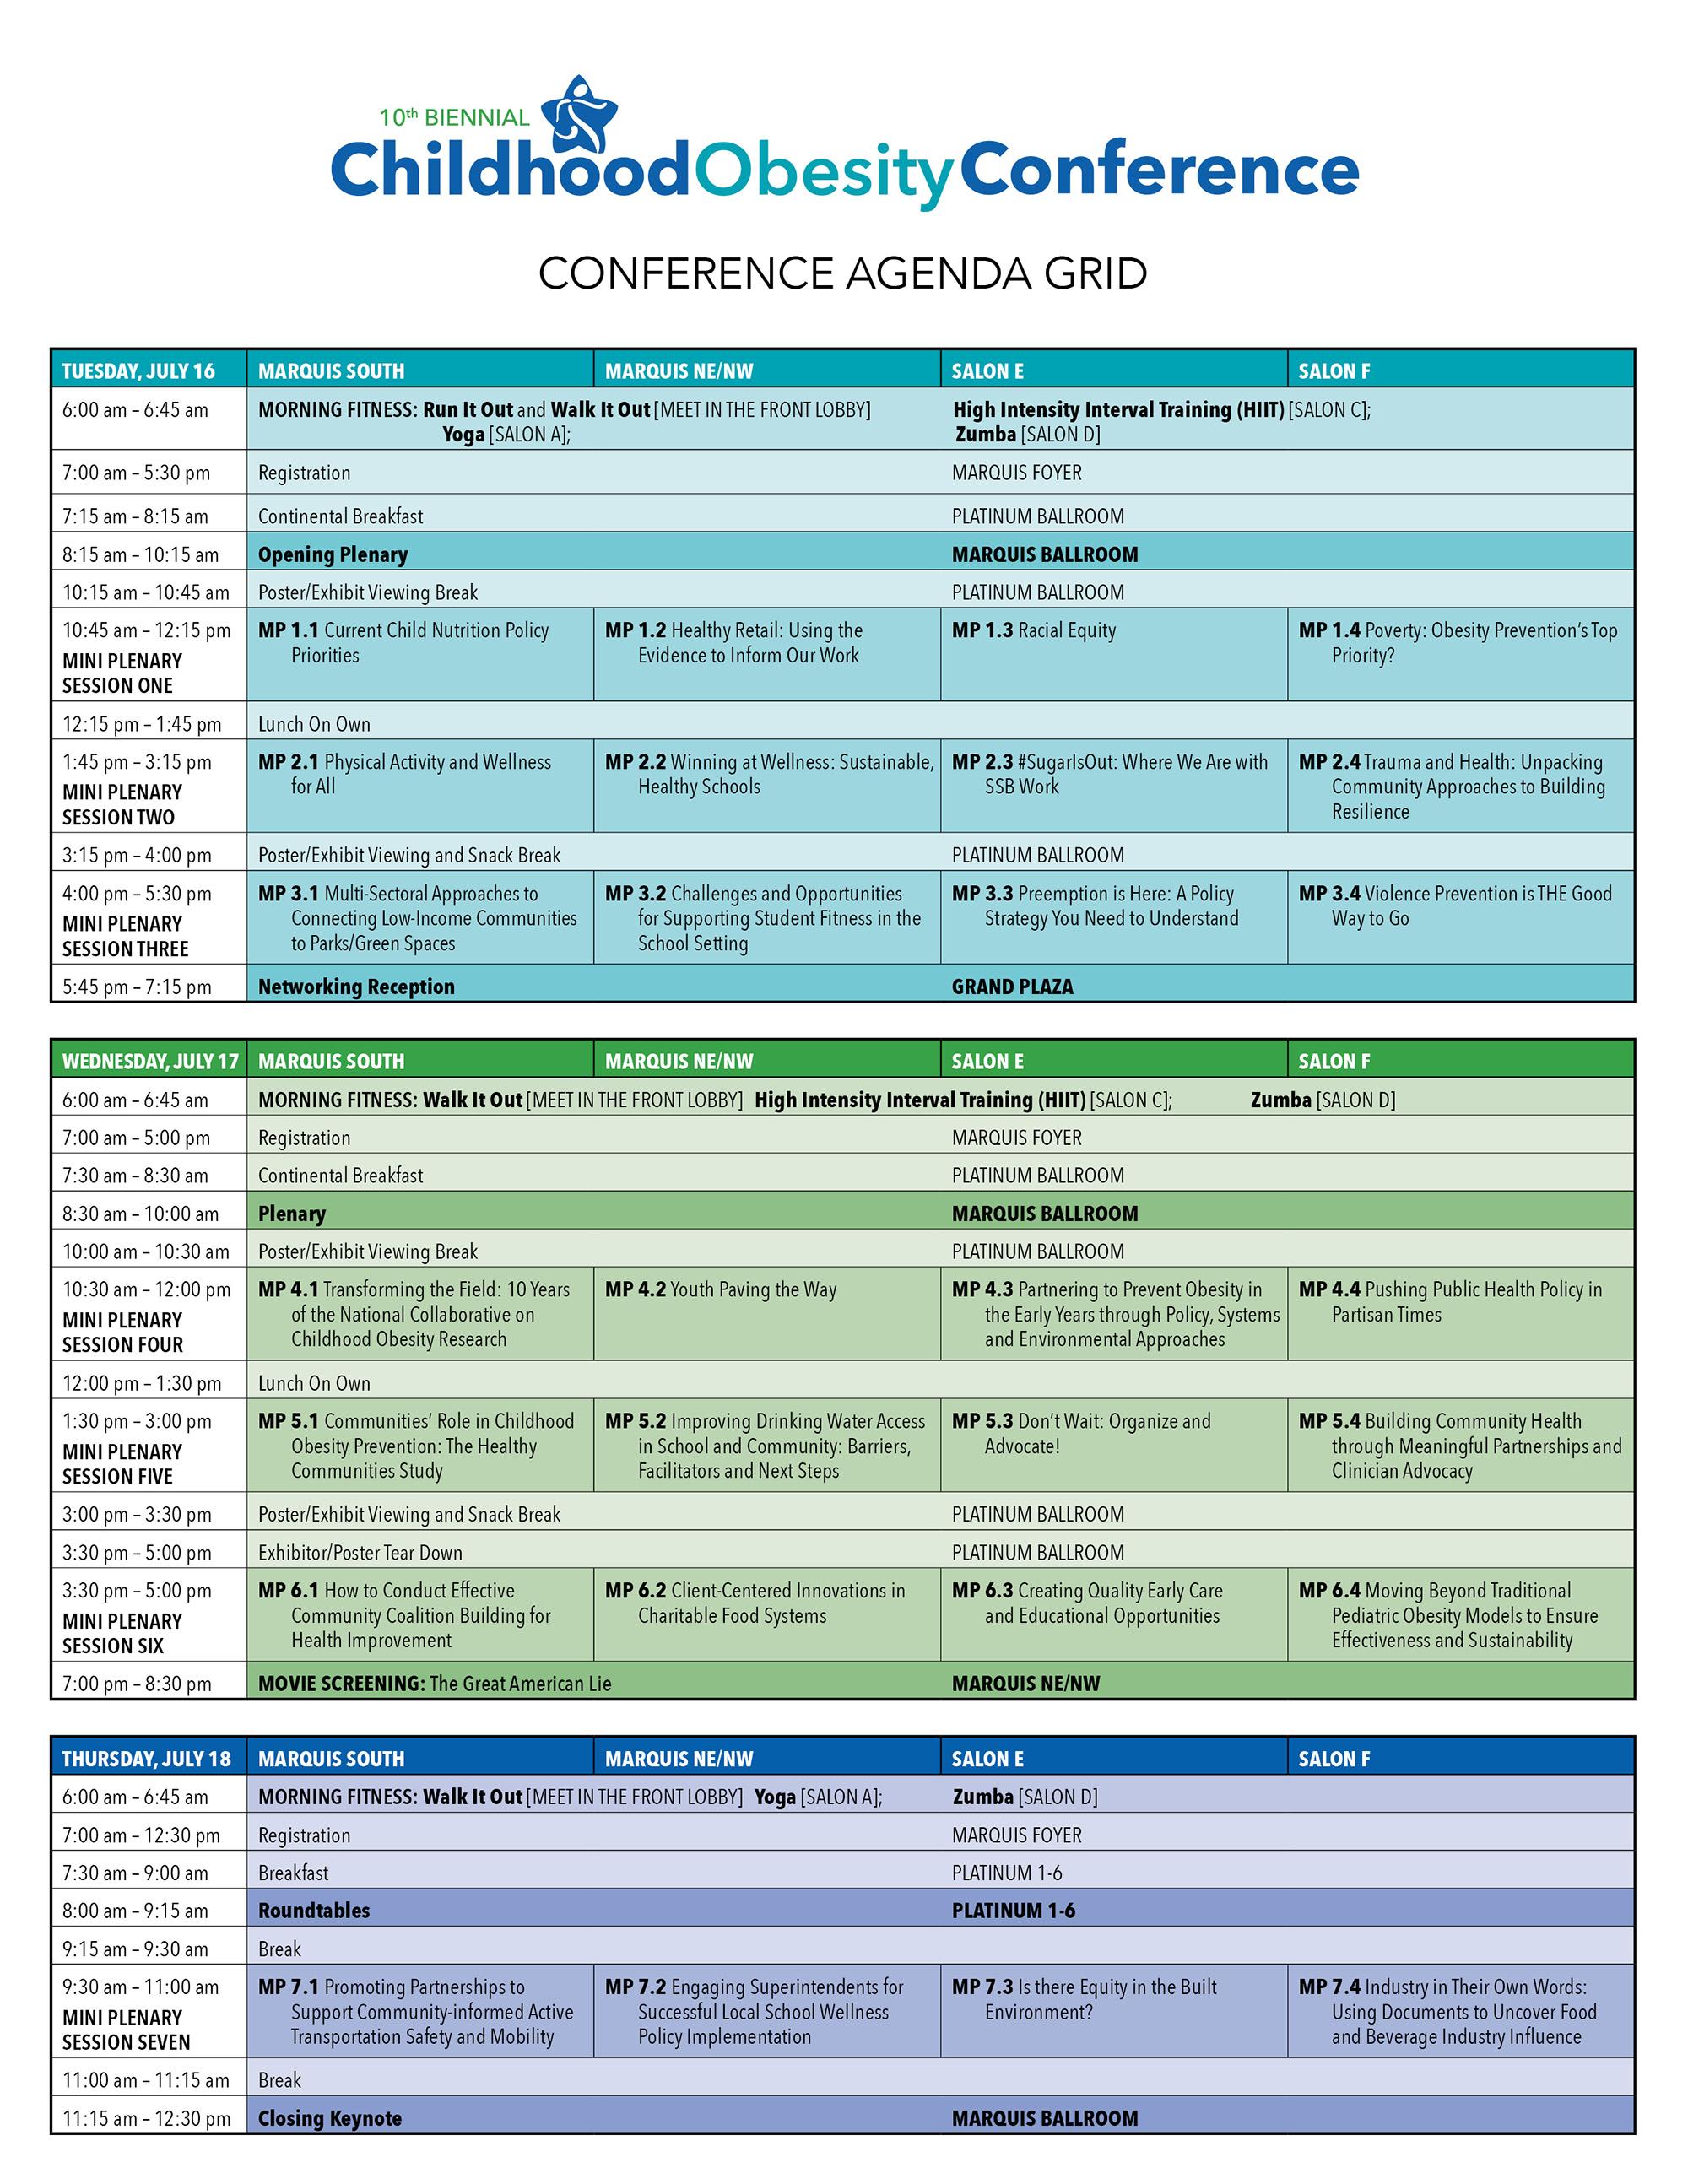 COC19-Agenda Grid-v6